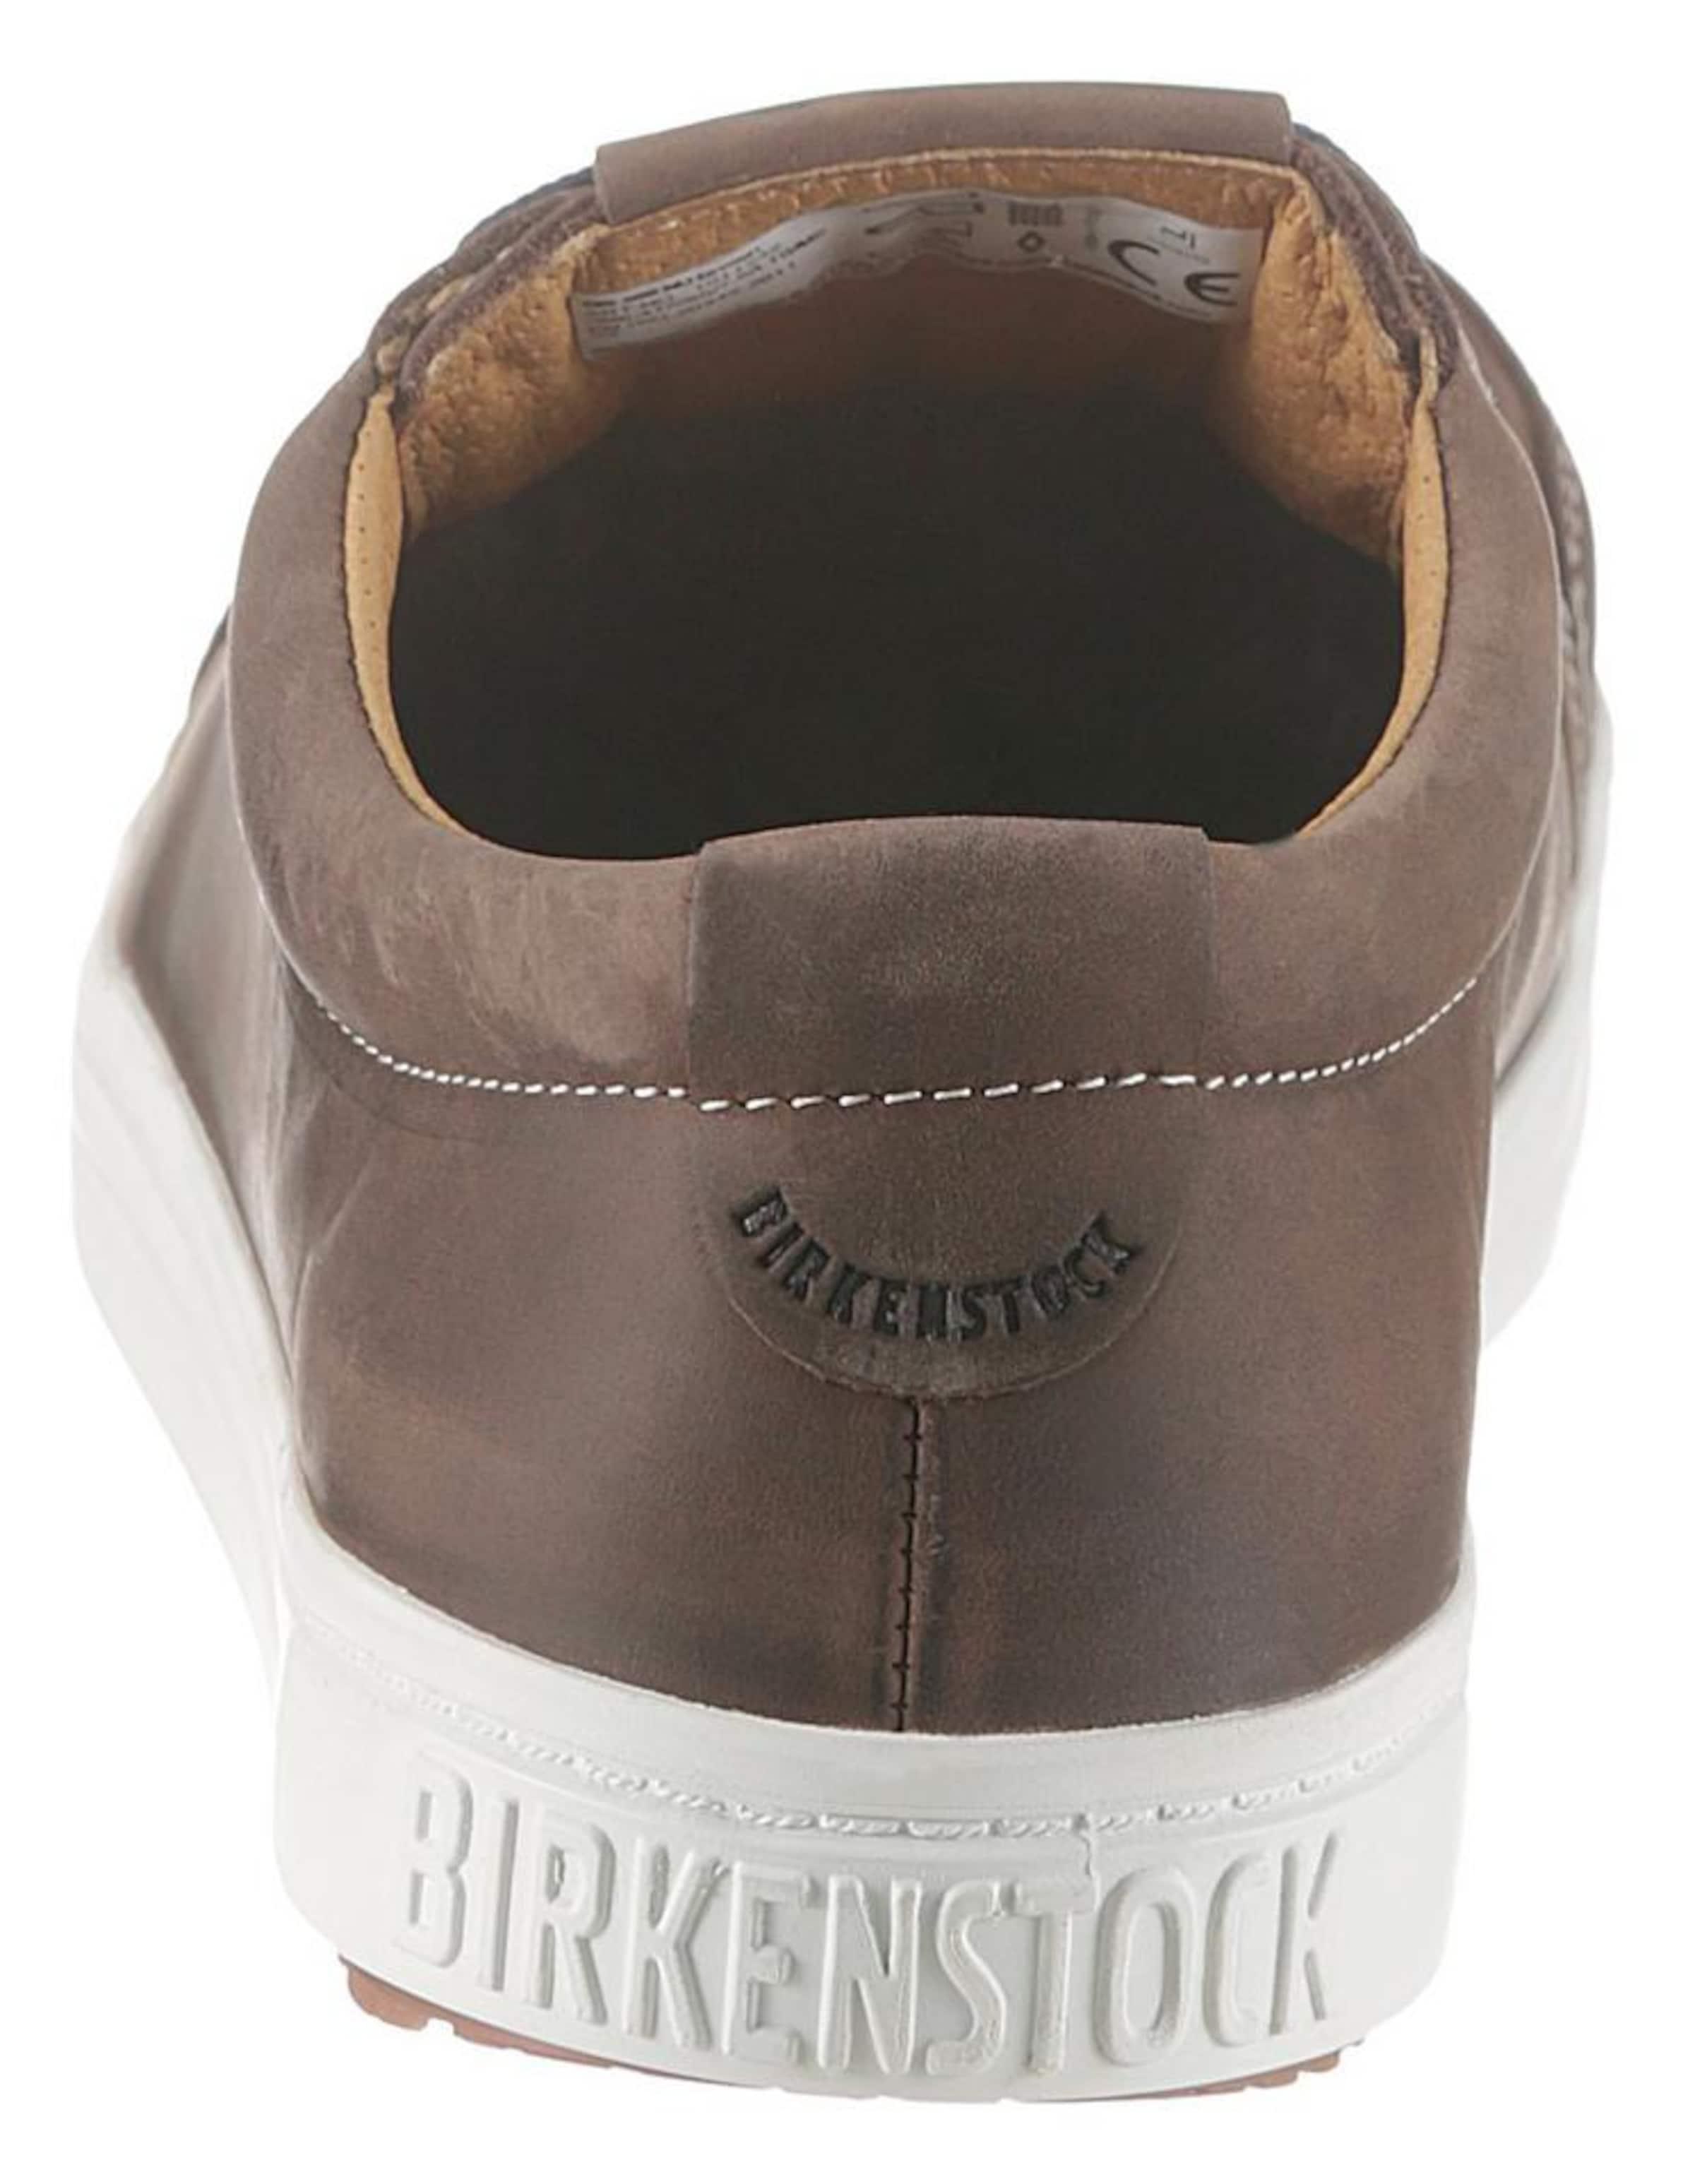 TaubenblauBraun Birkenstock Schuhe In Birkenstock Schuhe gb76fyY